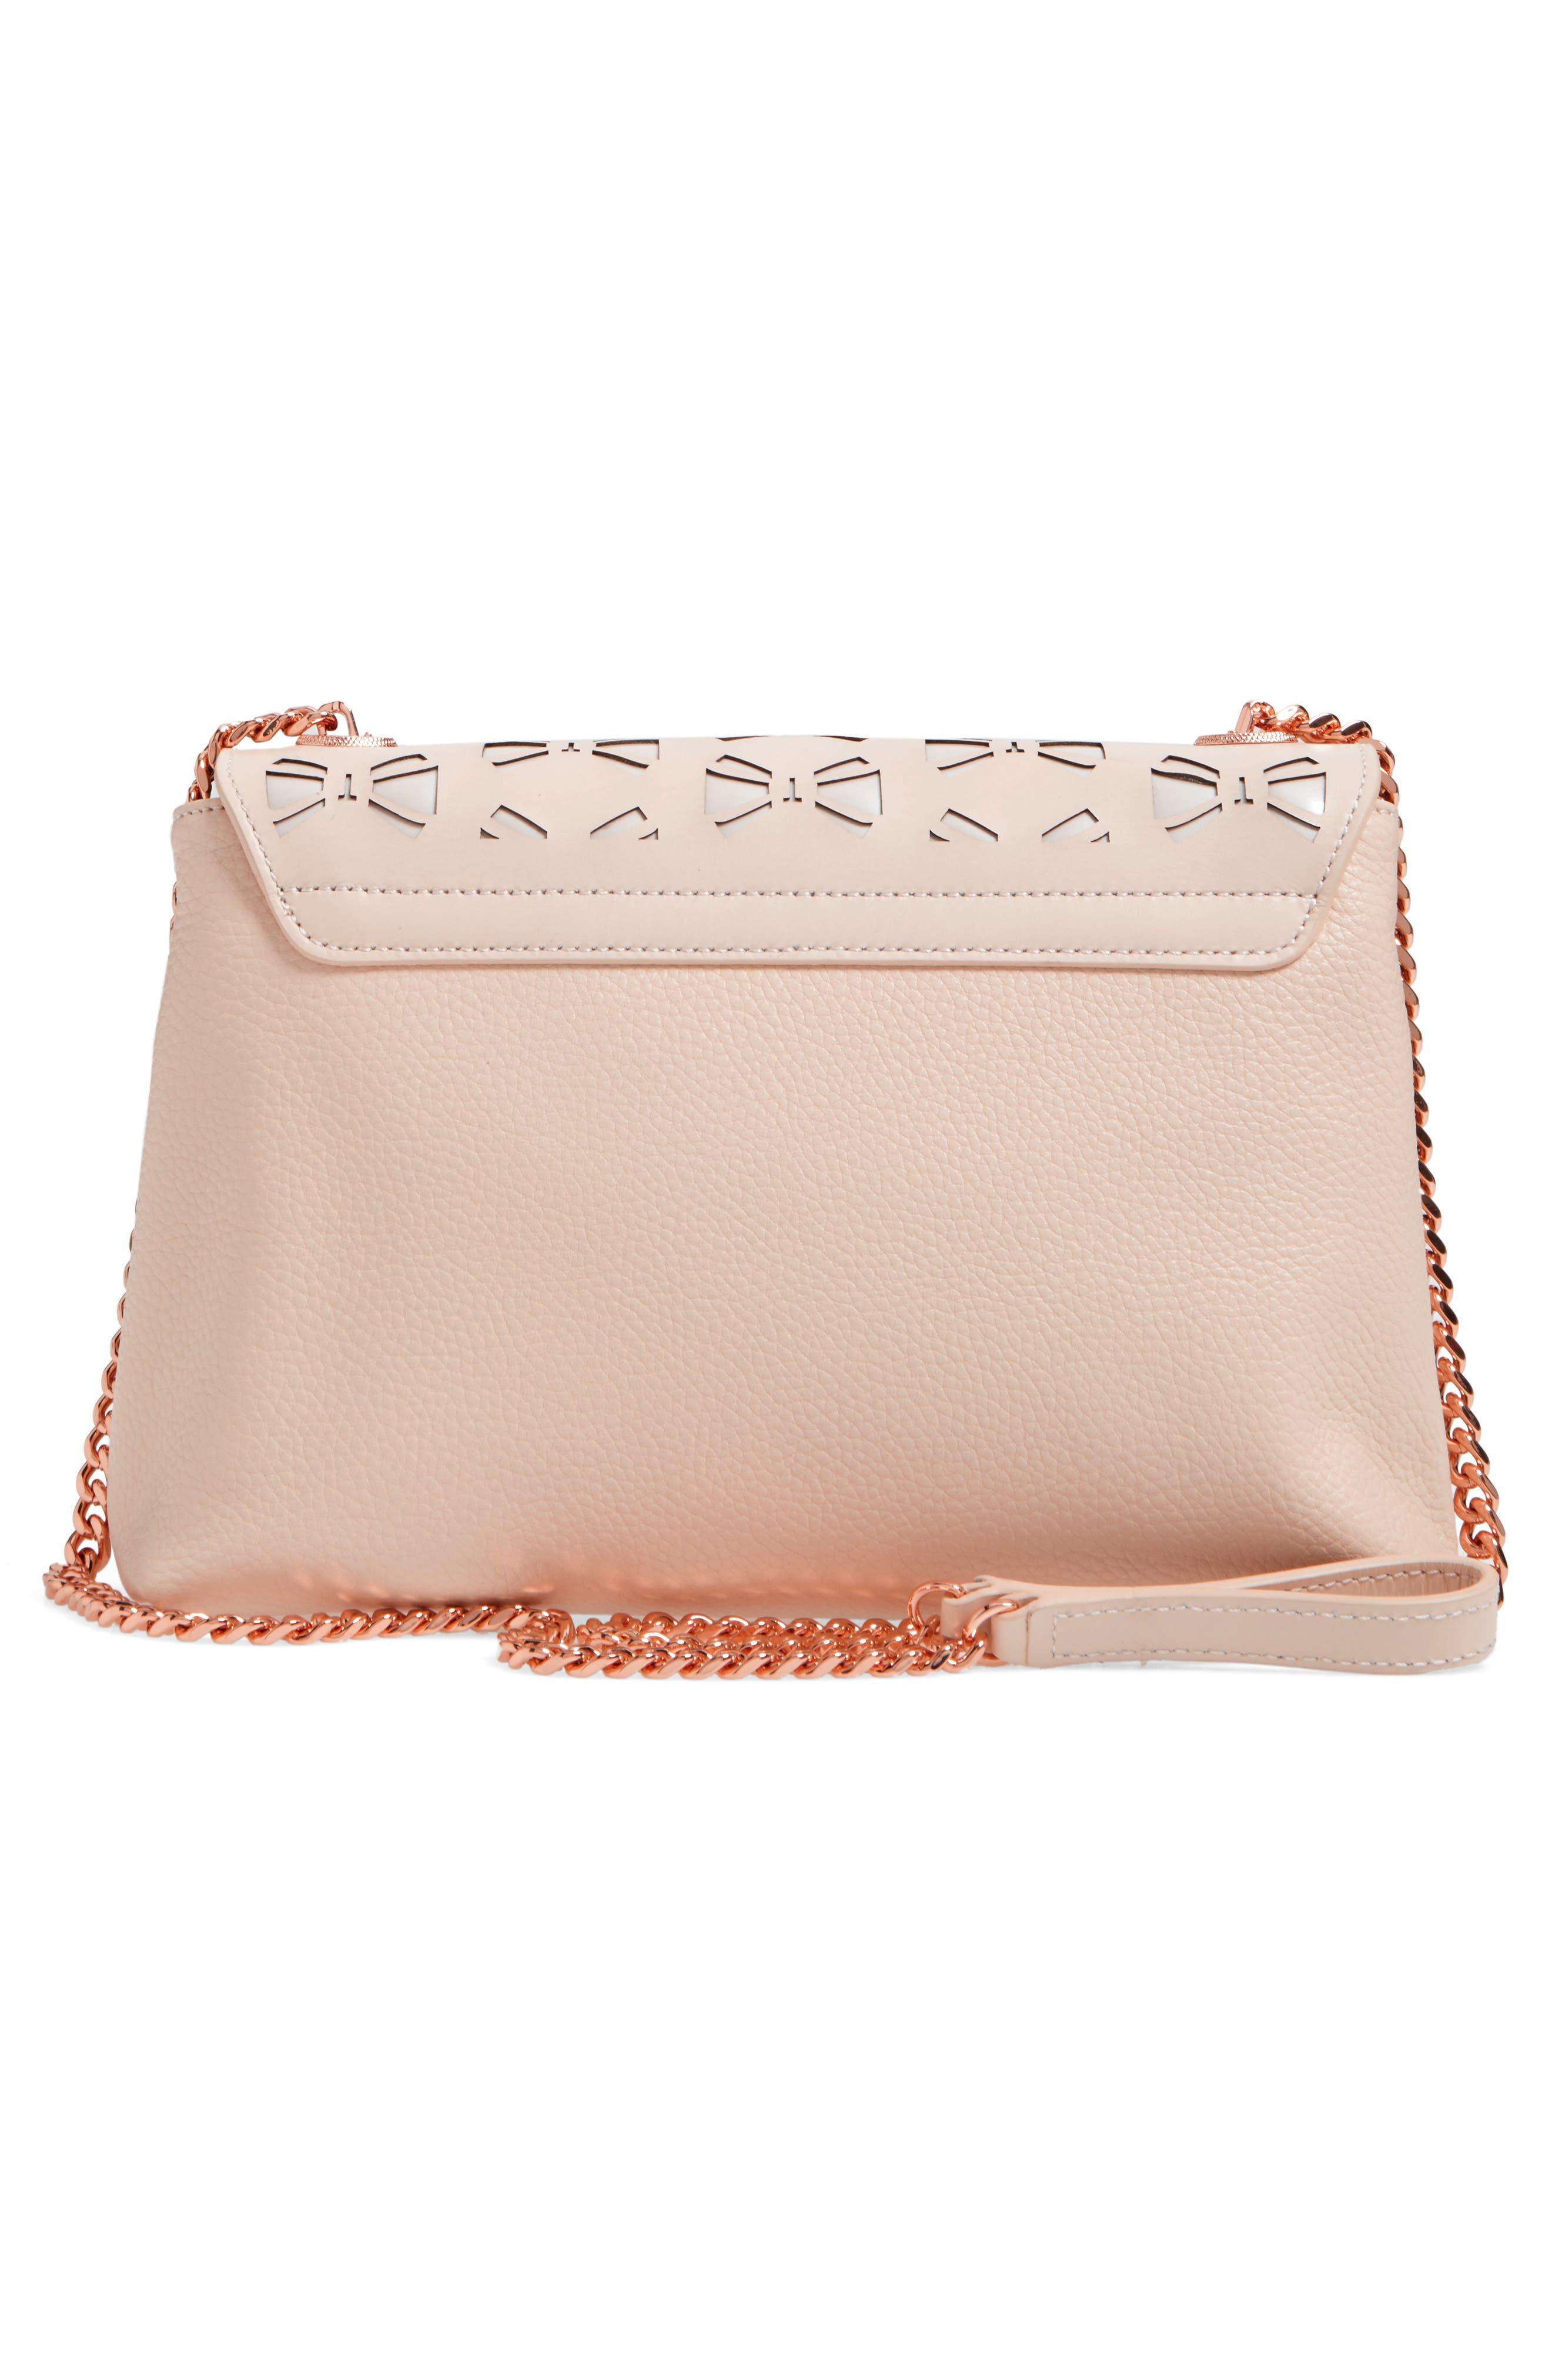 Alternate Image 3  - Ted Baker London Leather Crossbody Bag